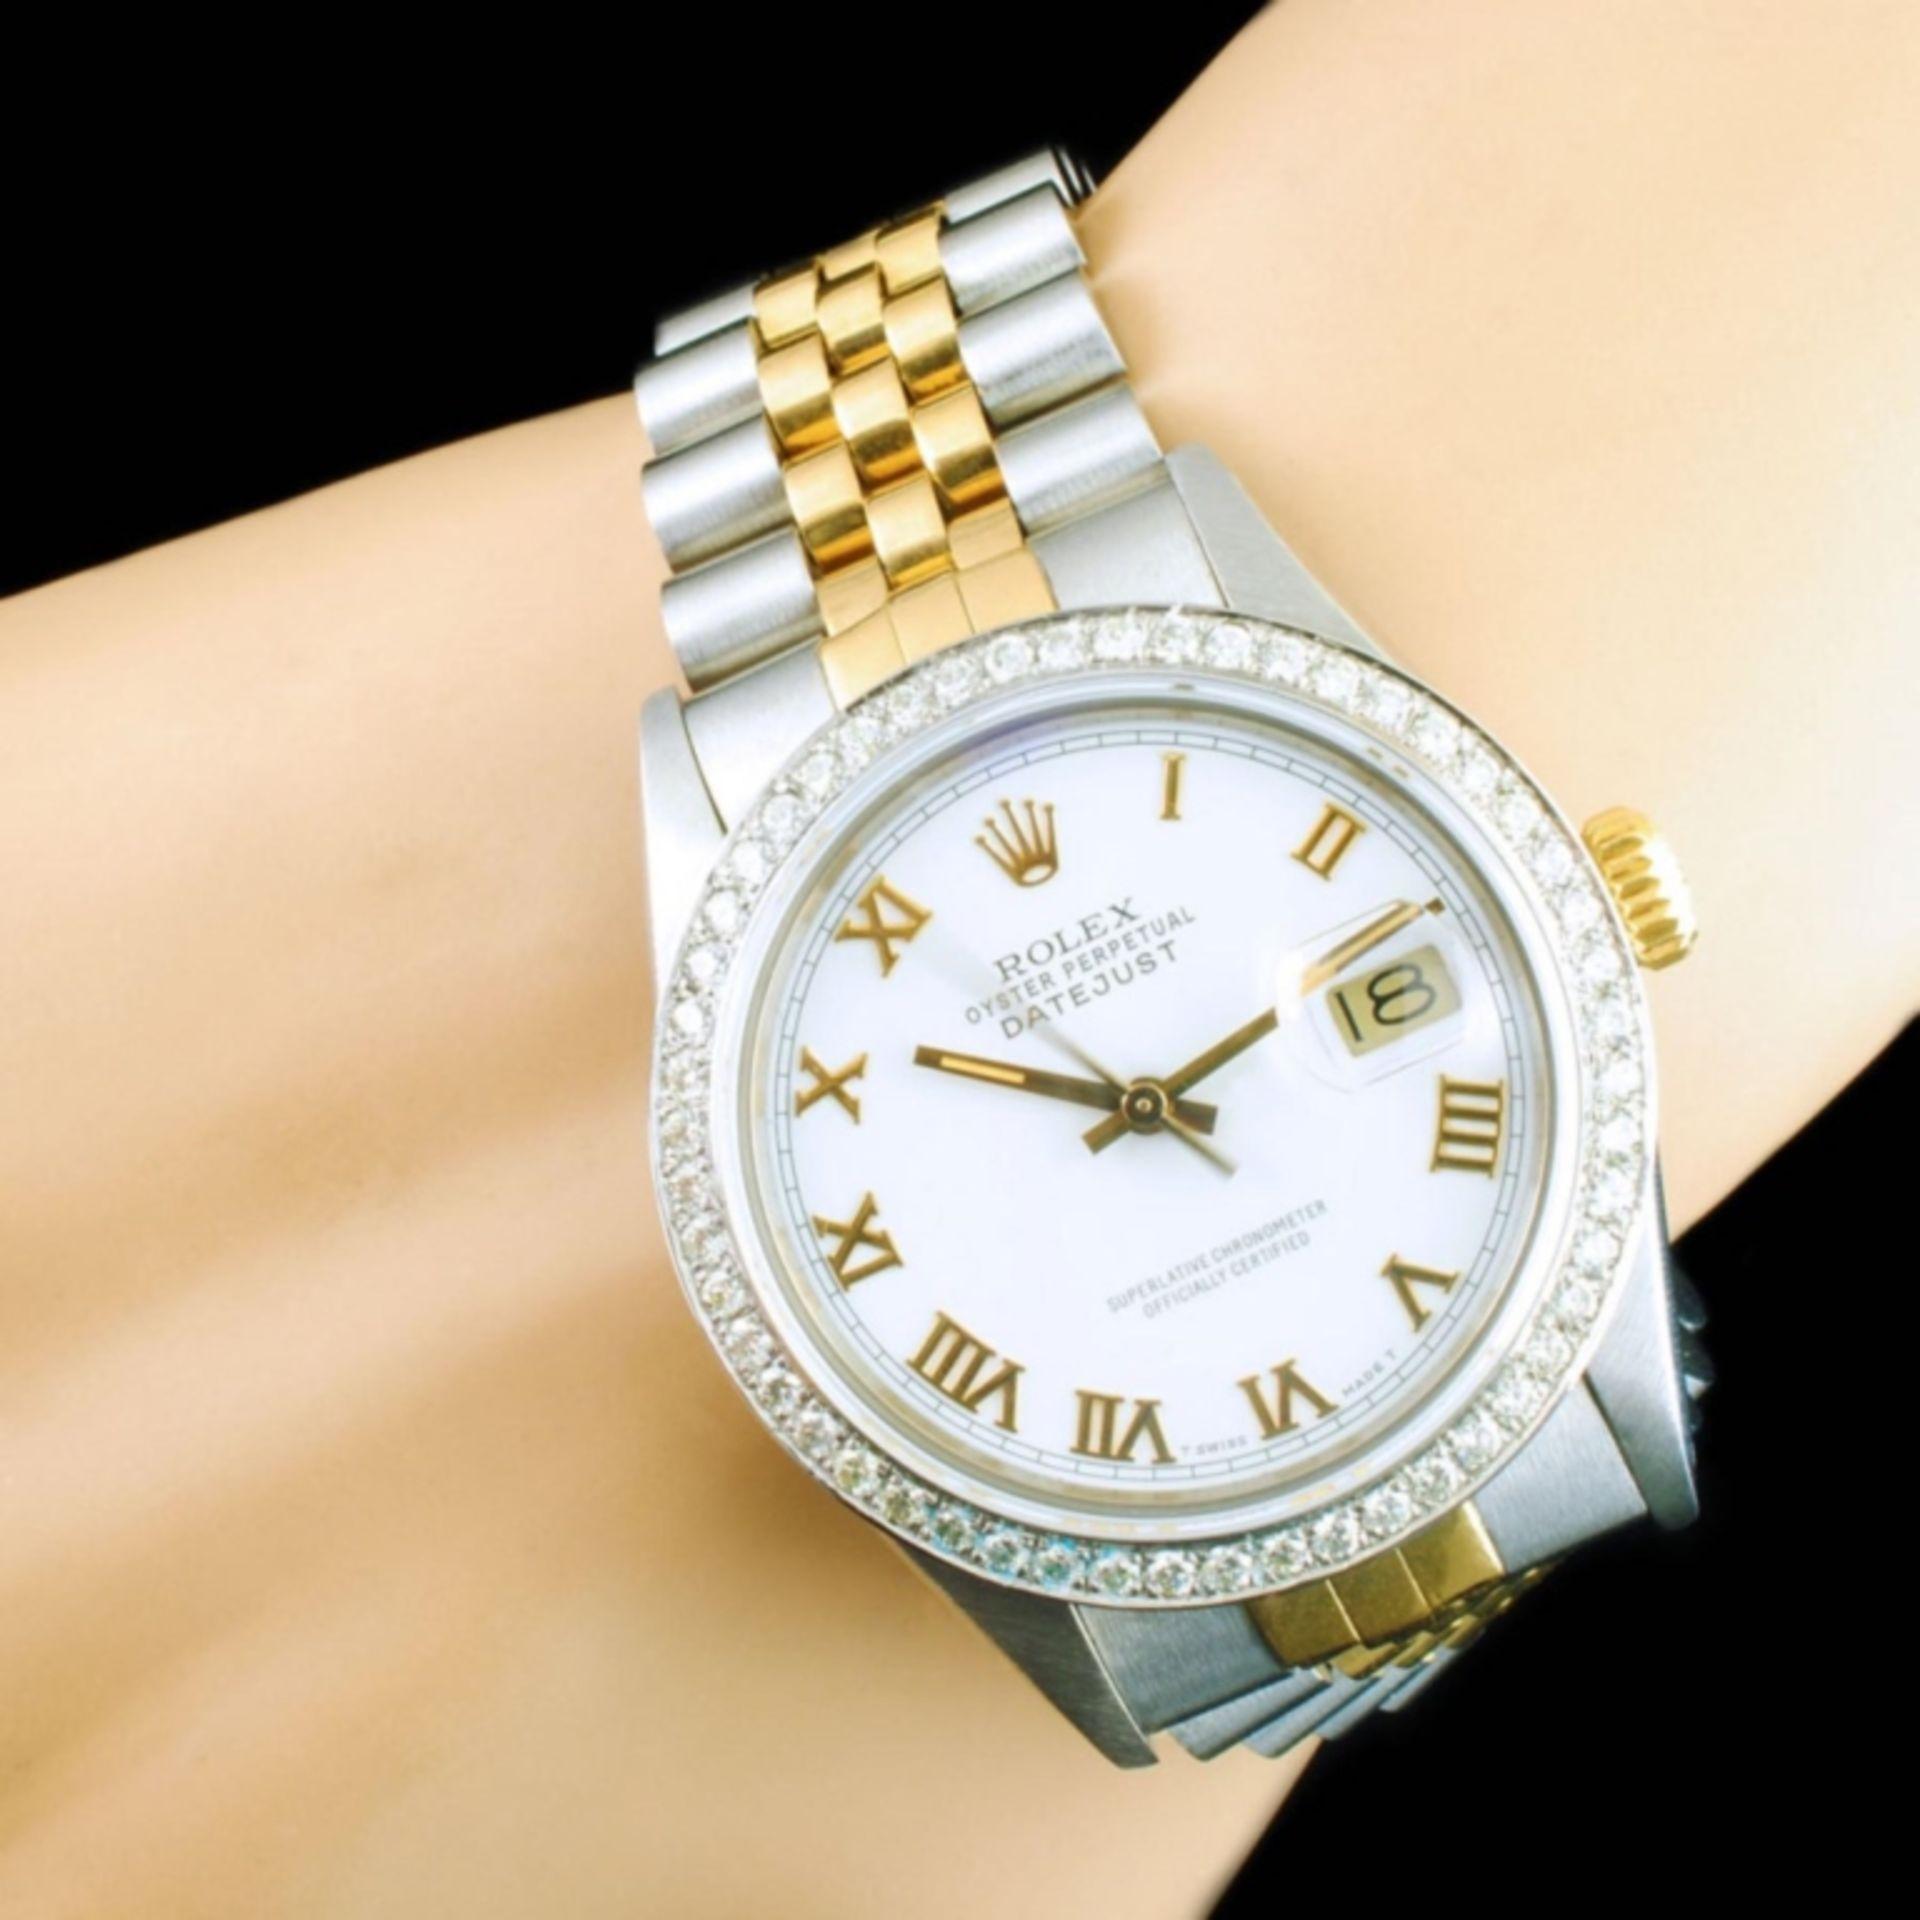 Rolex DateJust YG/SS Diamond 36mm Wristwatch - Image 2 of 6